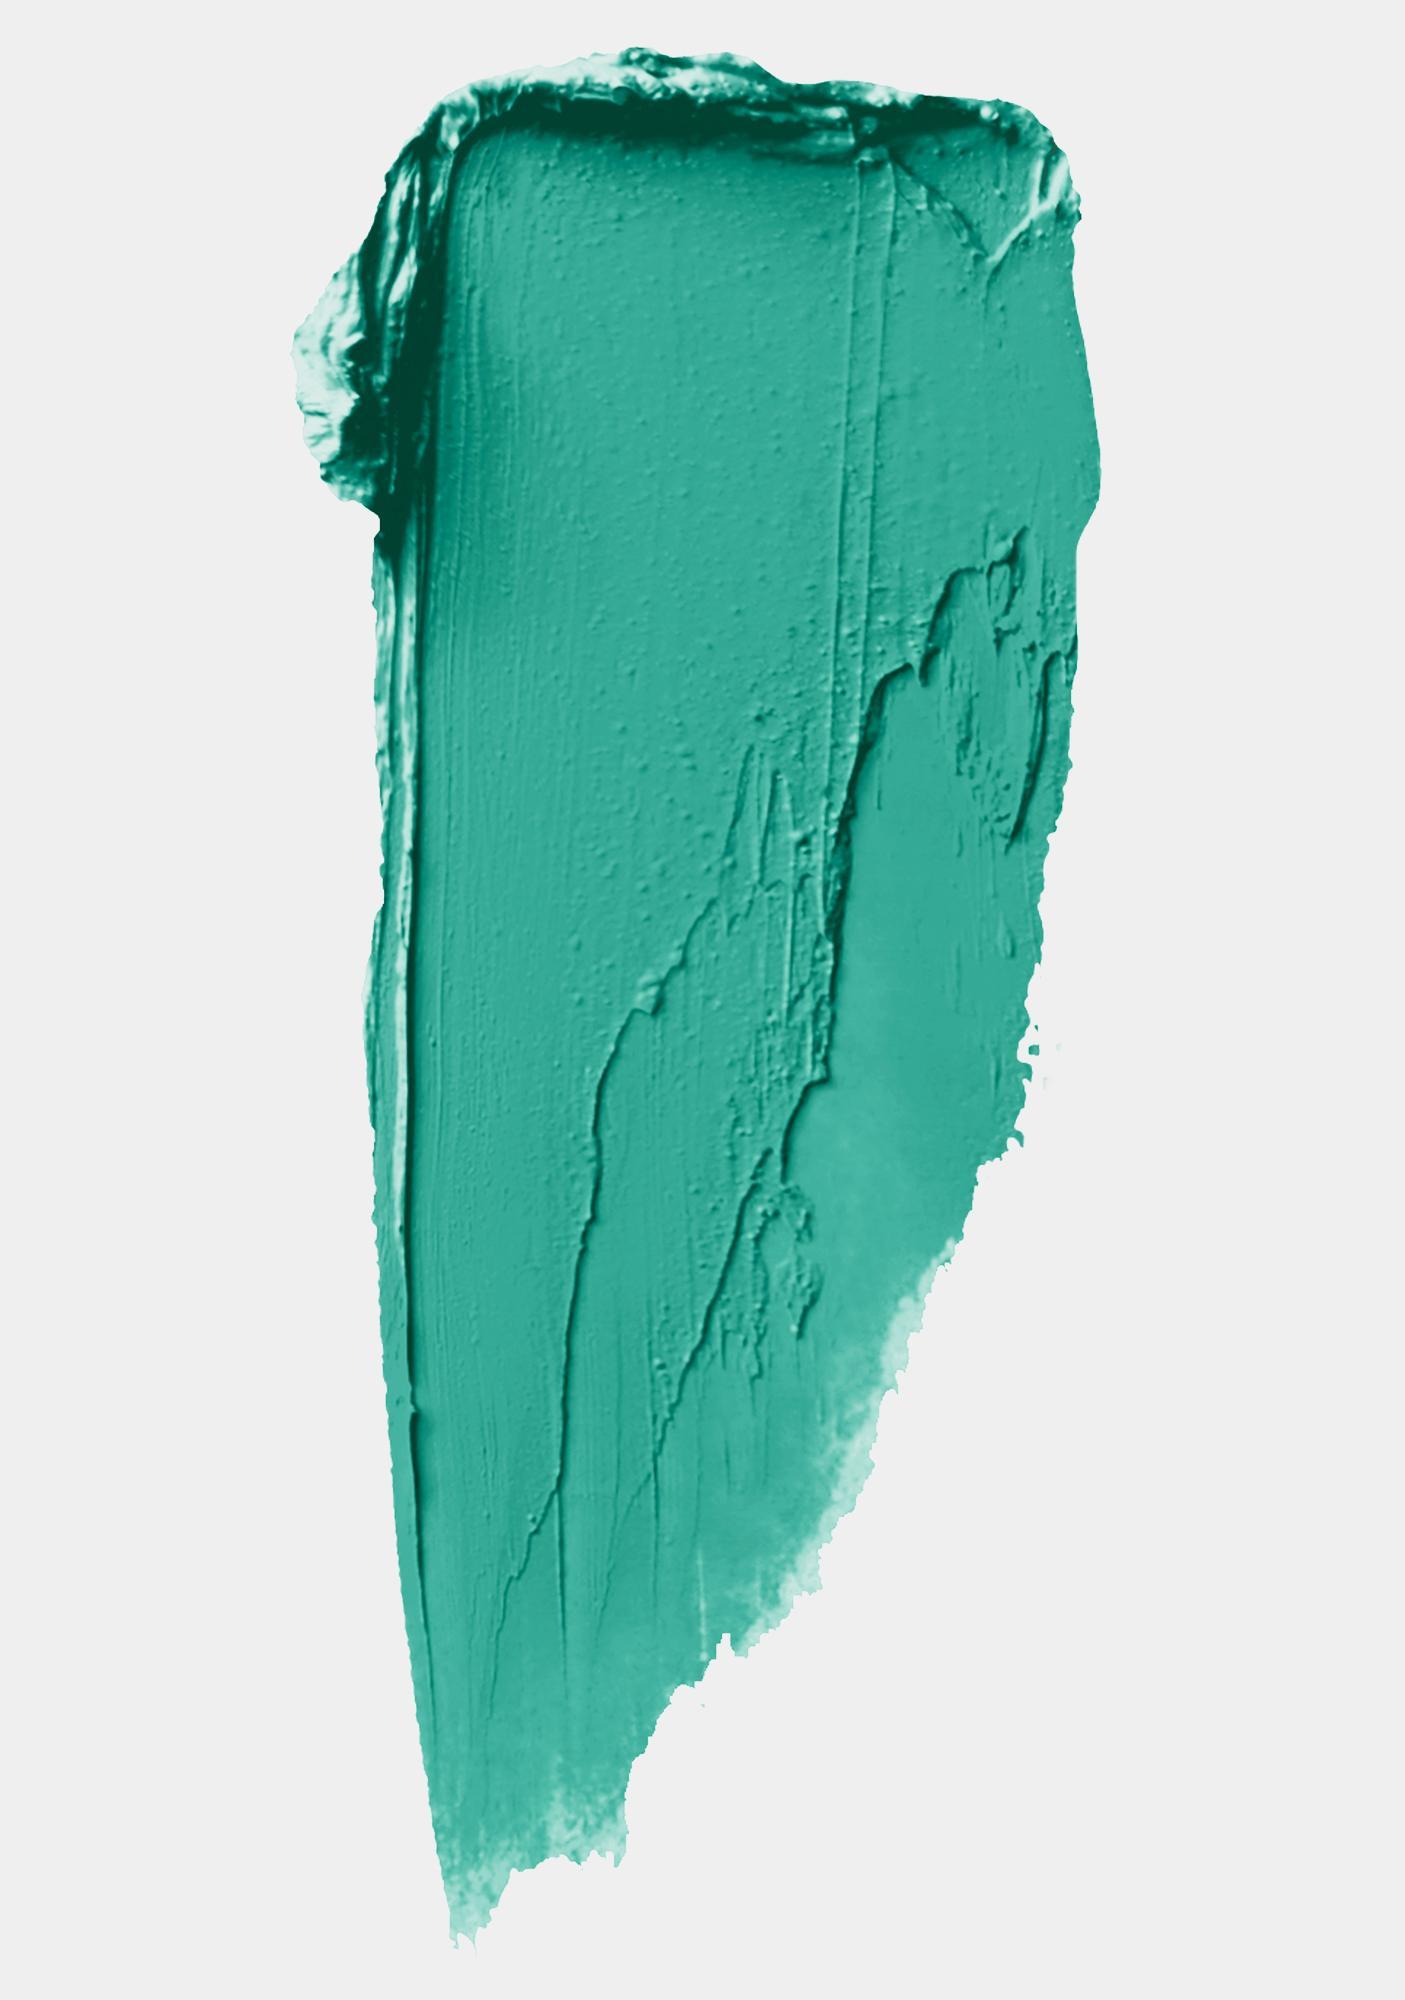 NYX Professional Makeup Whistler Electro Brights Matte Lip Cream